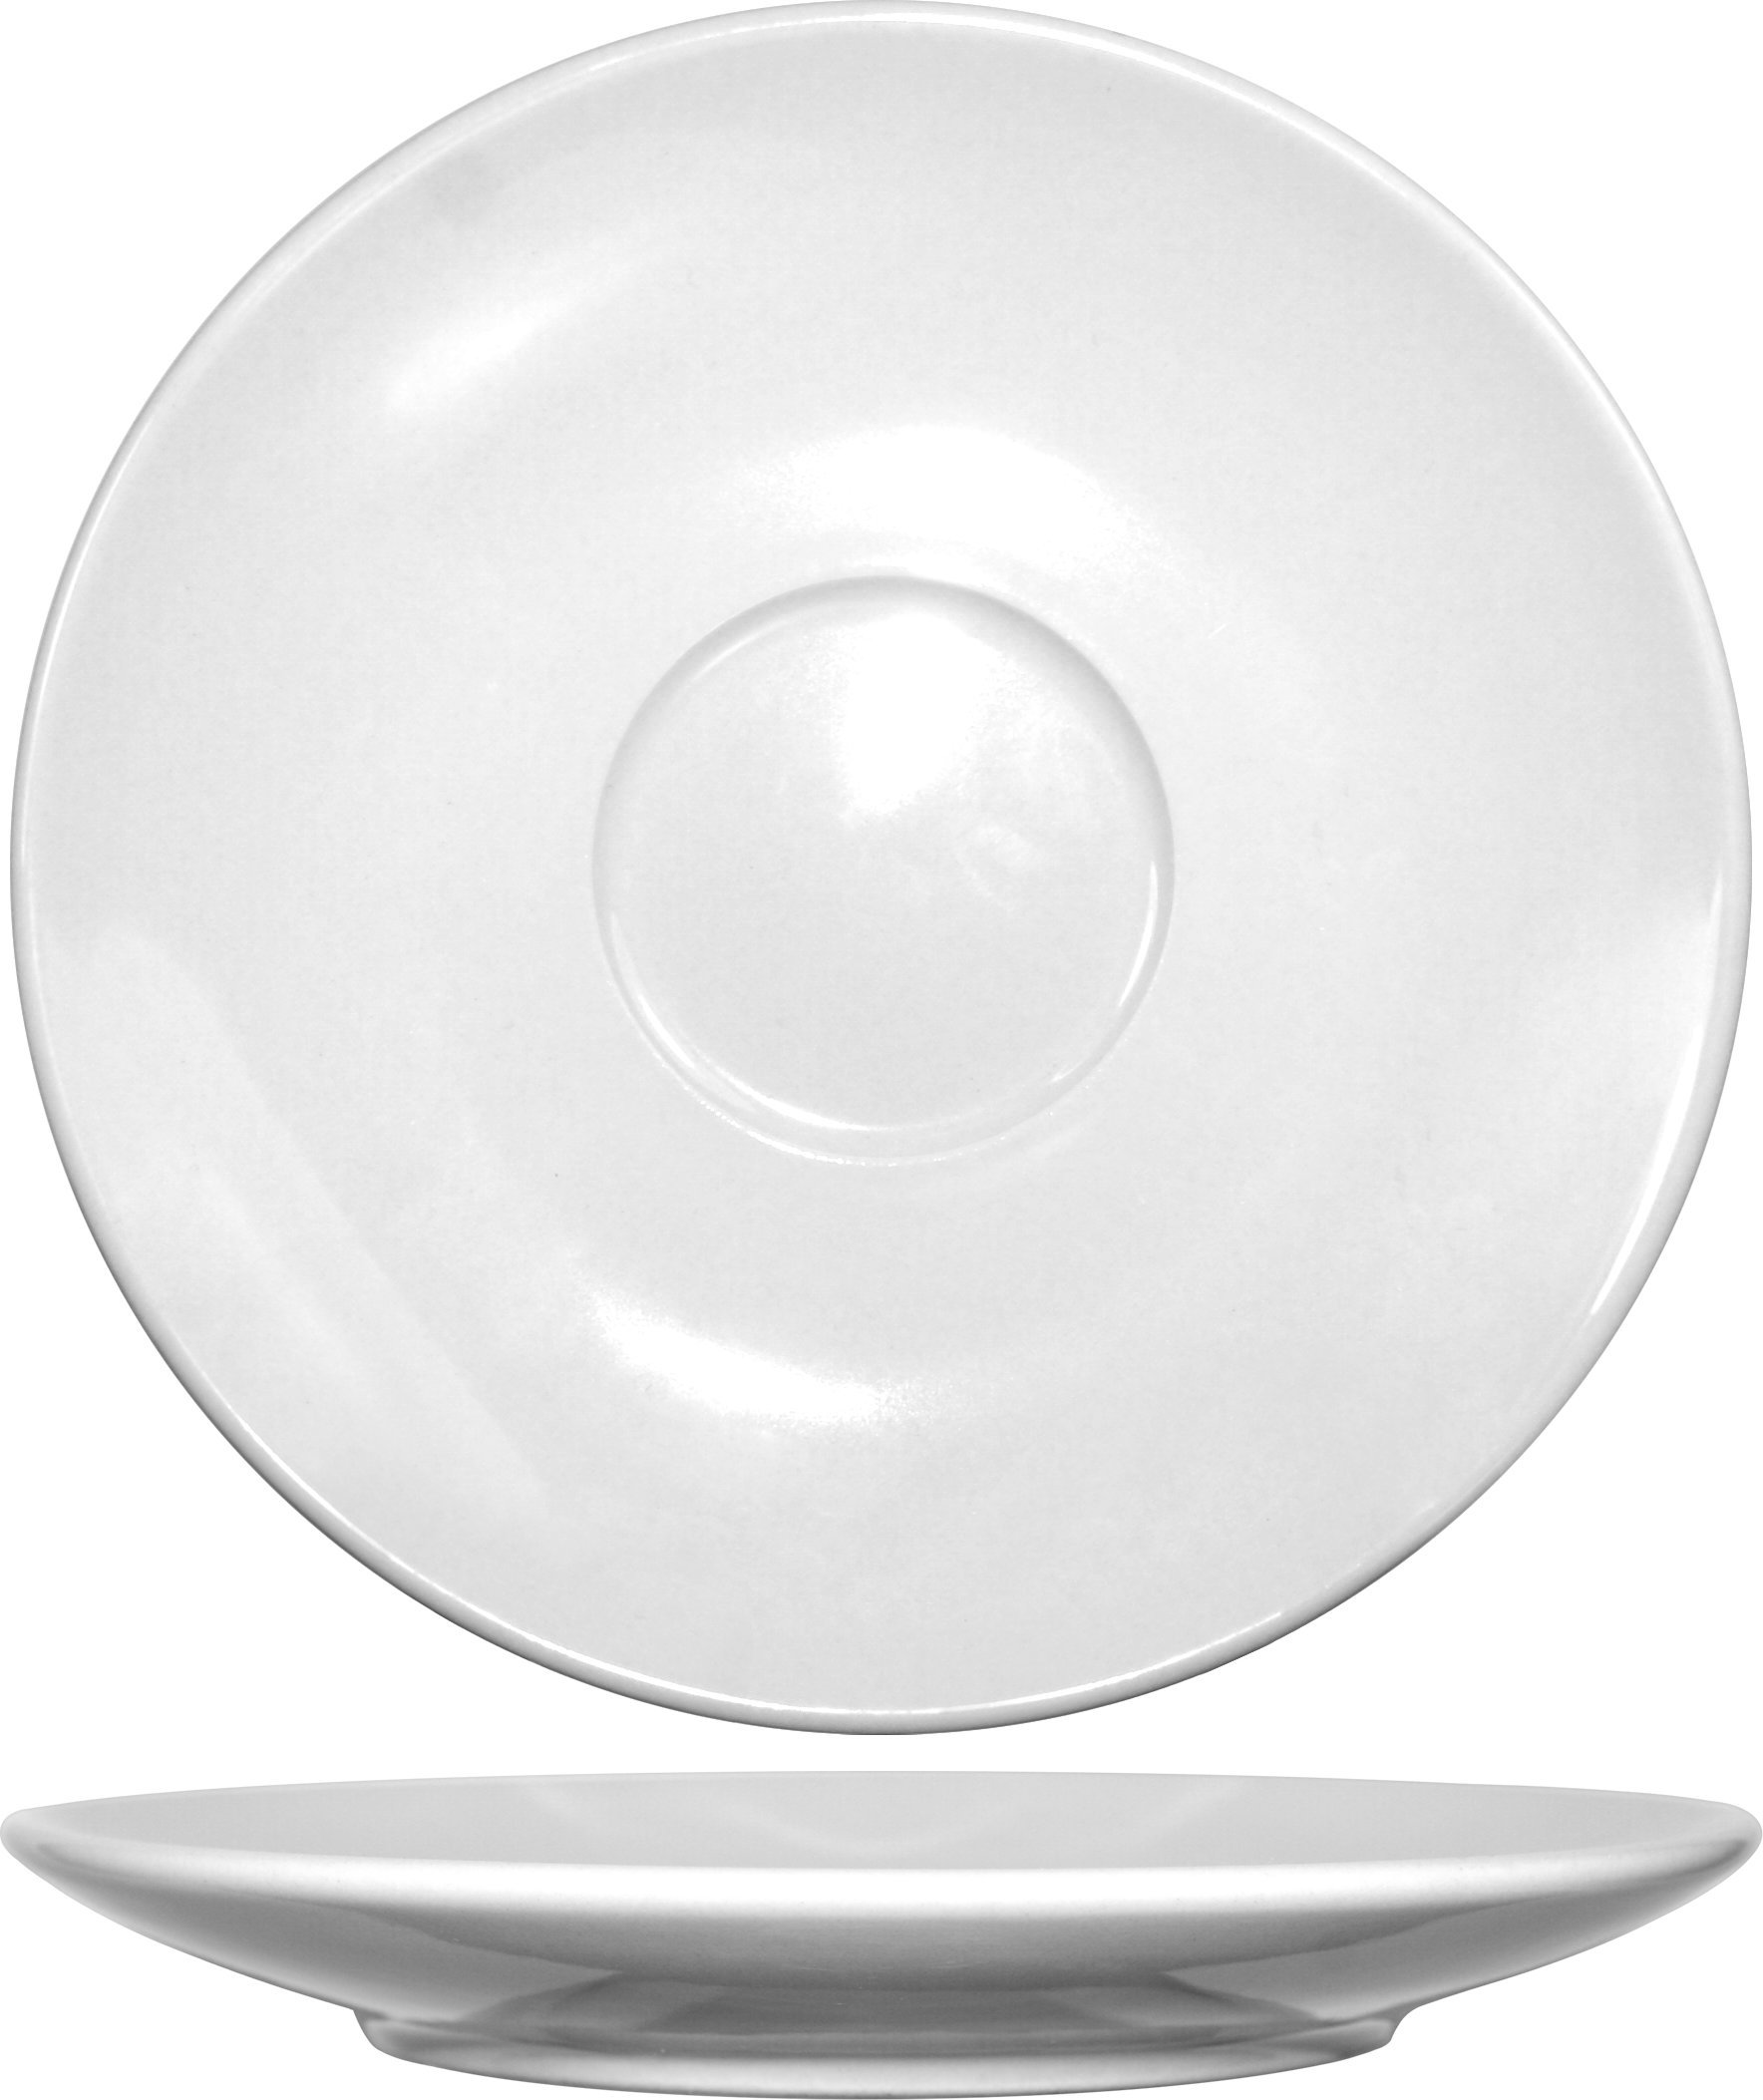 ITI DO-67 36-Piece Porcelain Dover Saucer for Cappuccino Cup, 12-Ounce, White